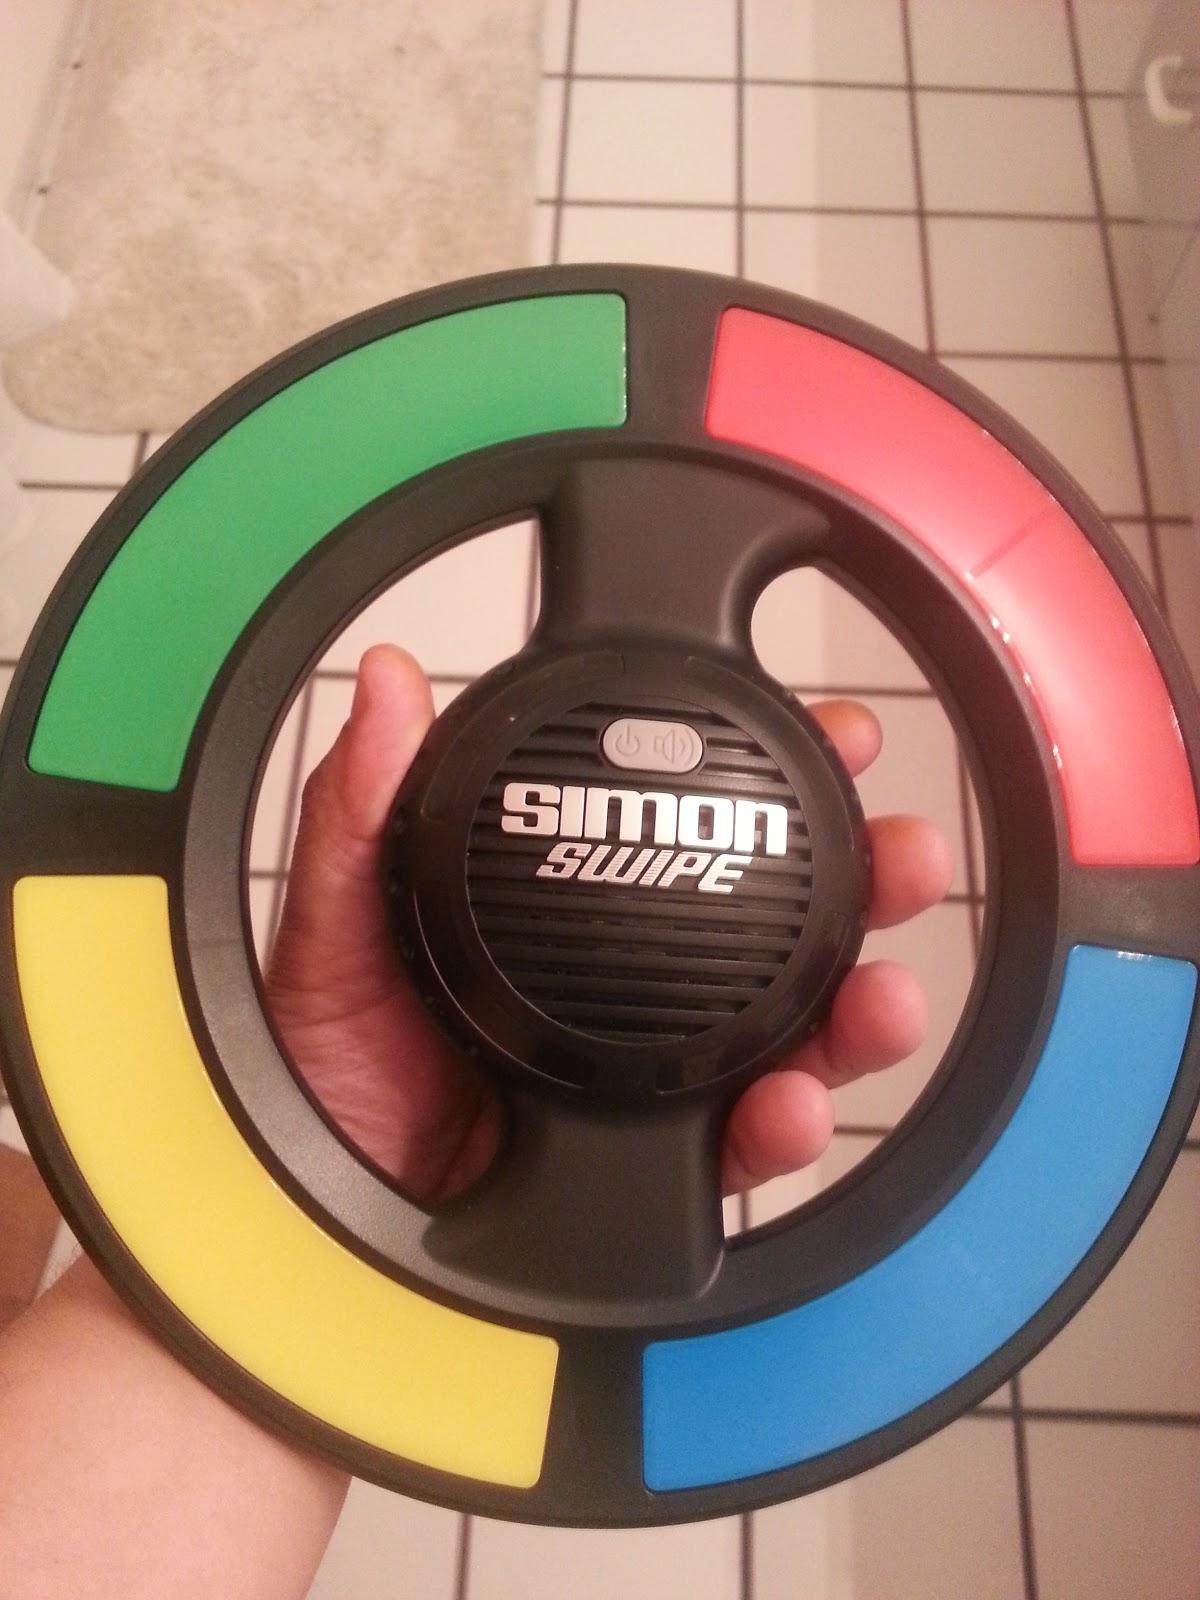 How to hold the Simon Swipe